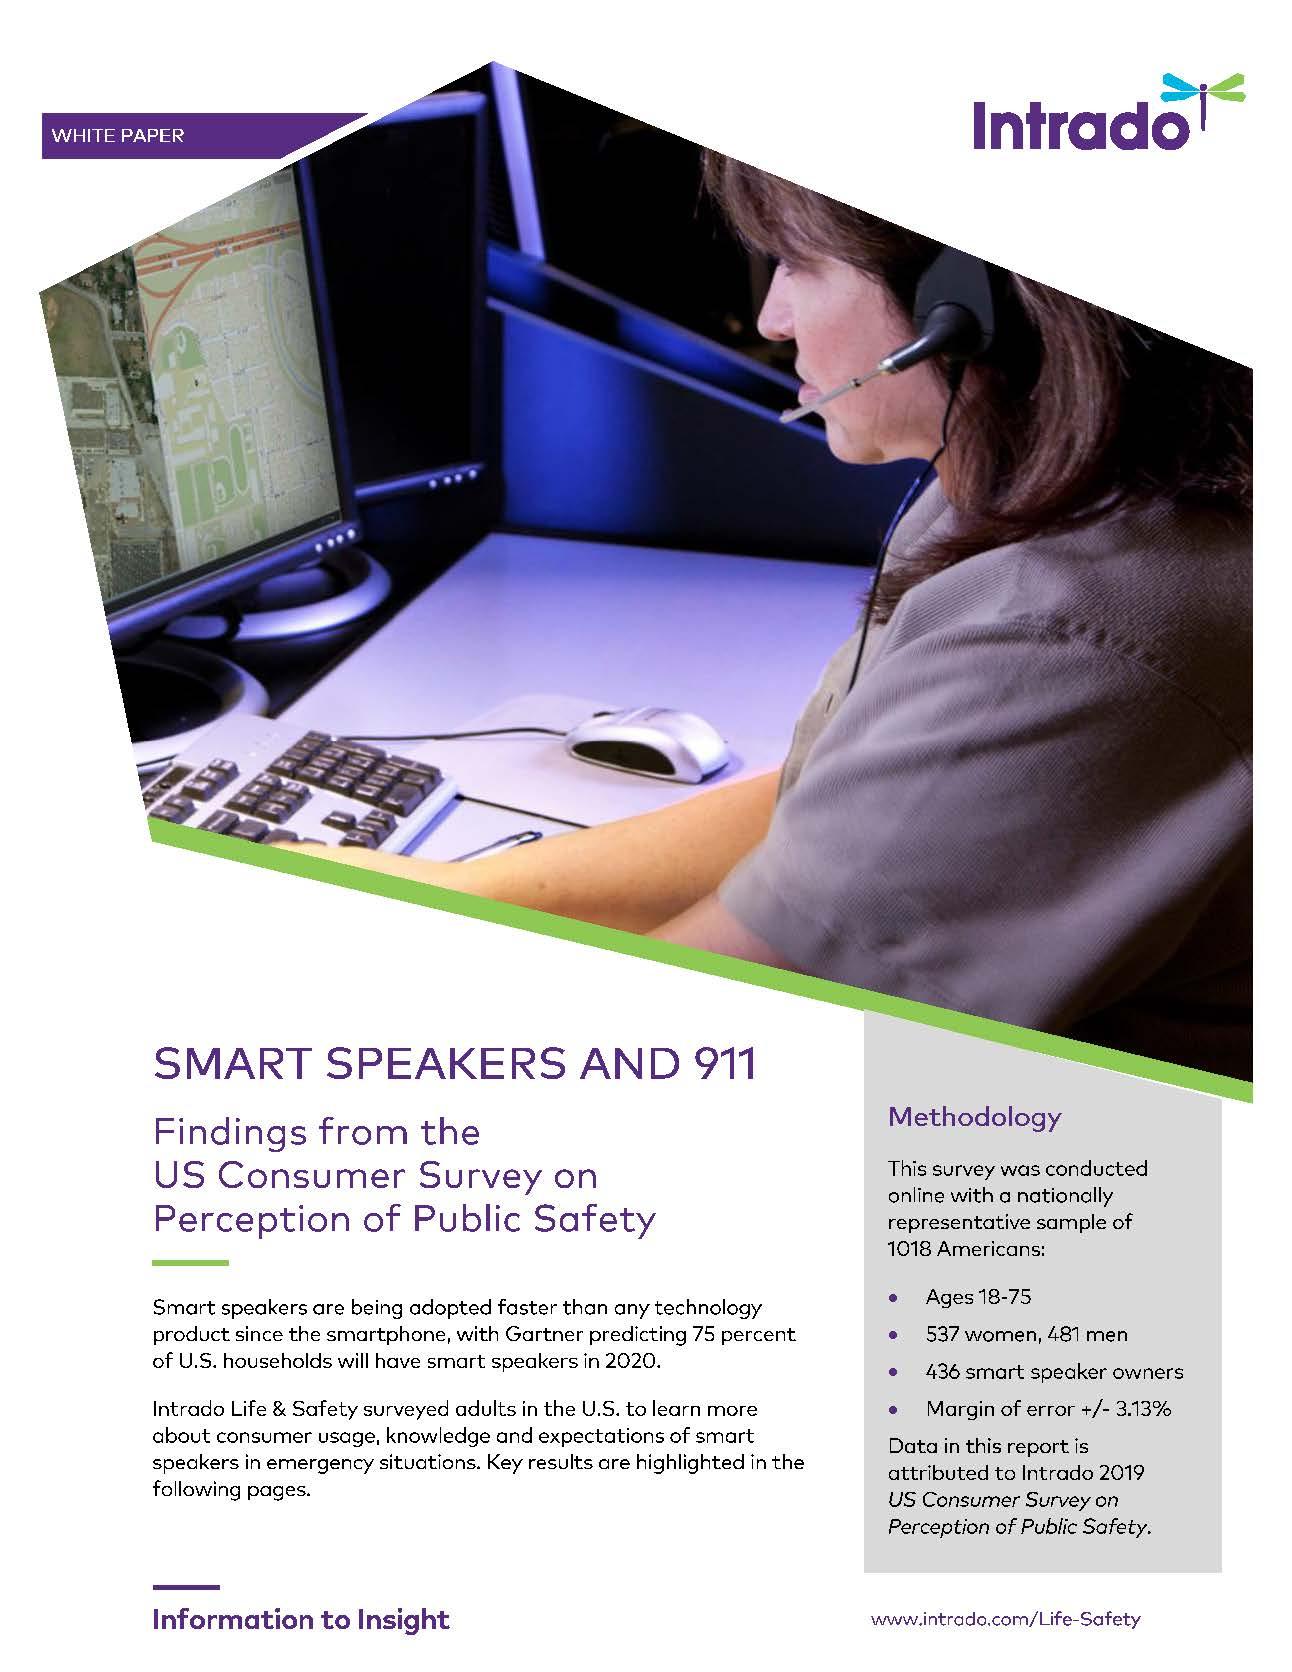 JONESBlog-June22-telecom-marketing-Intrado whitepaper-smart speakers copy (1)